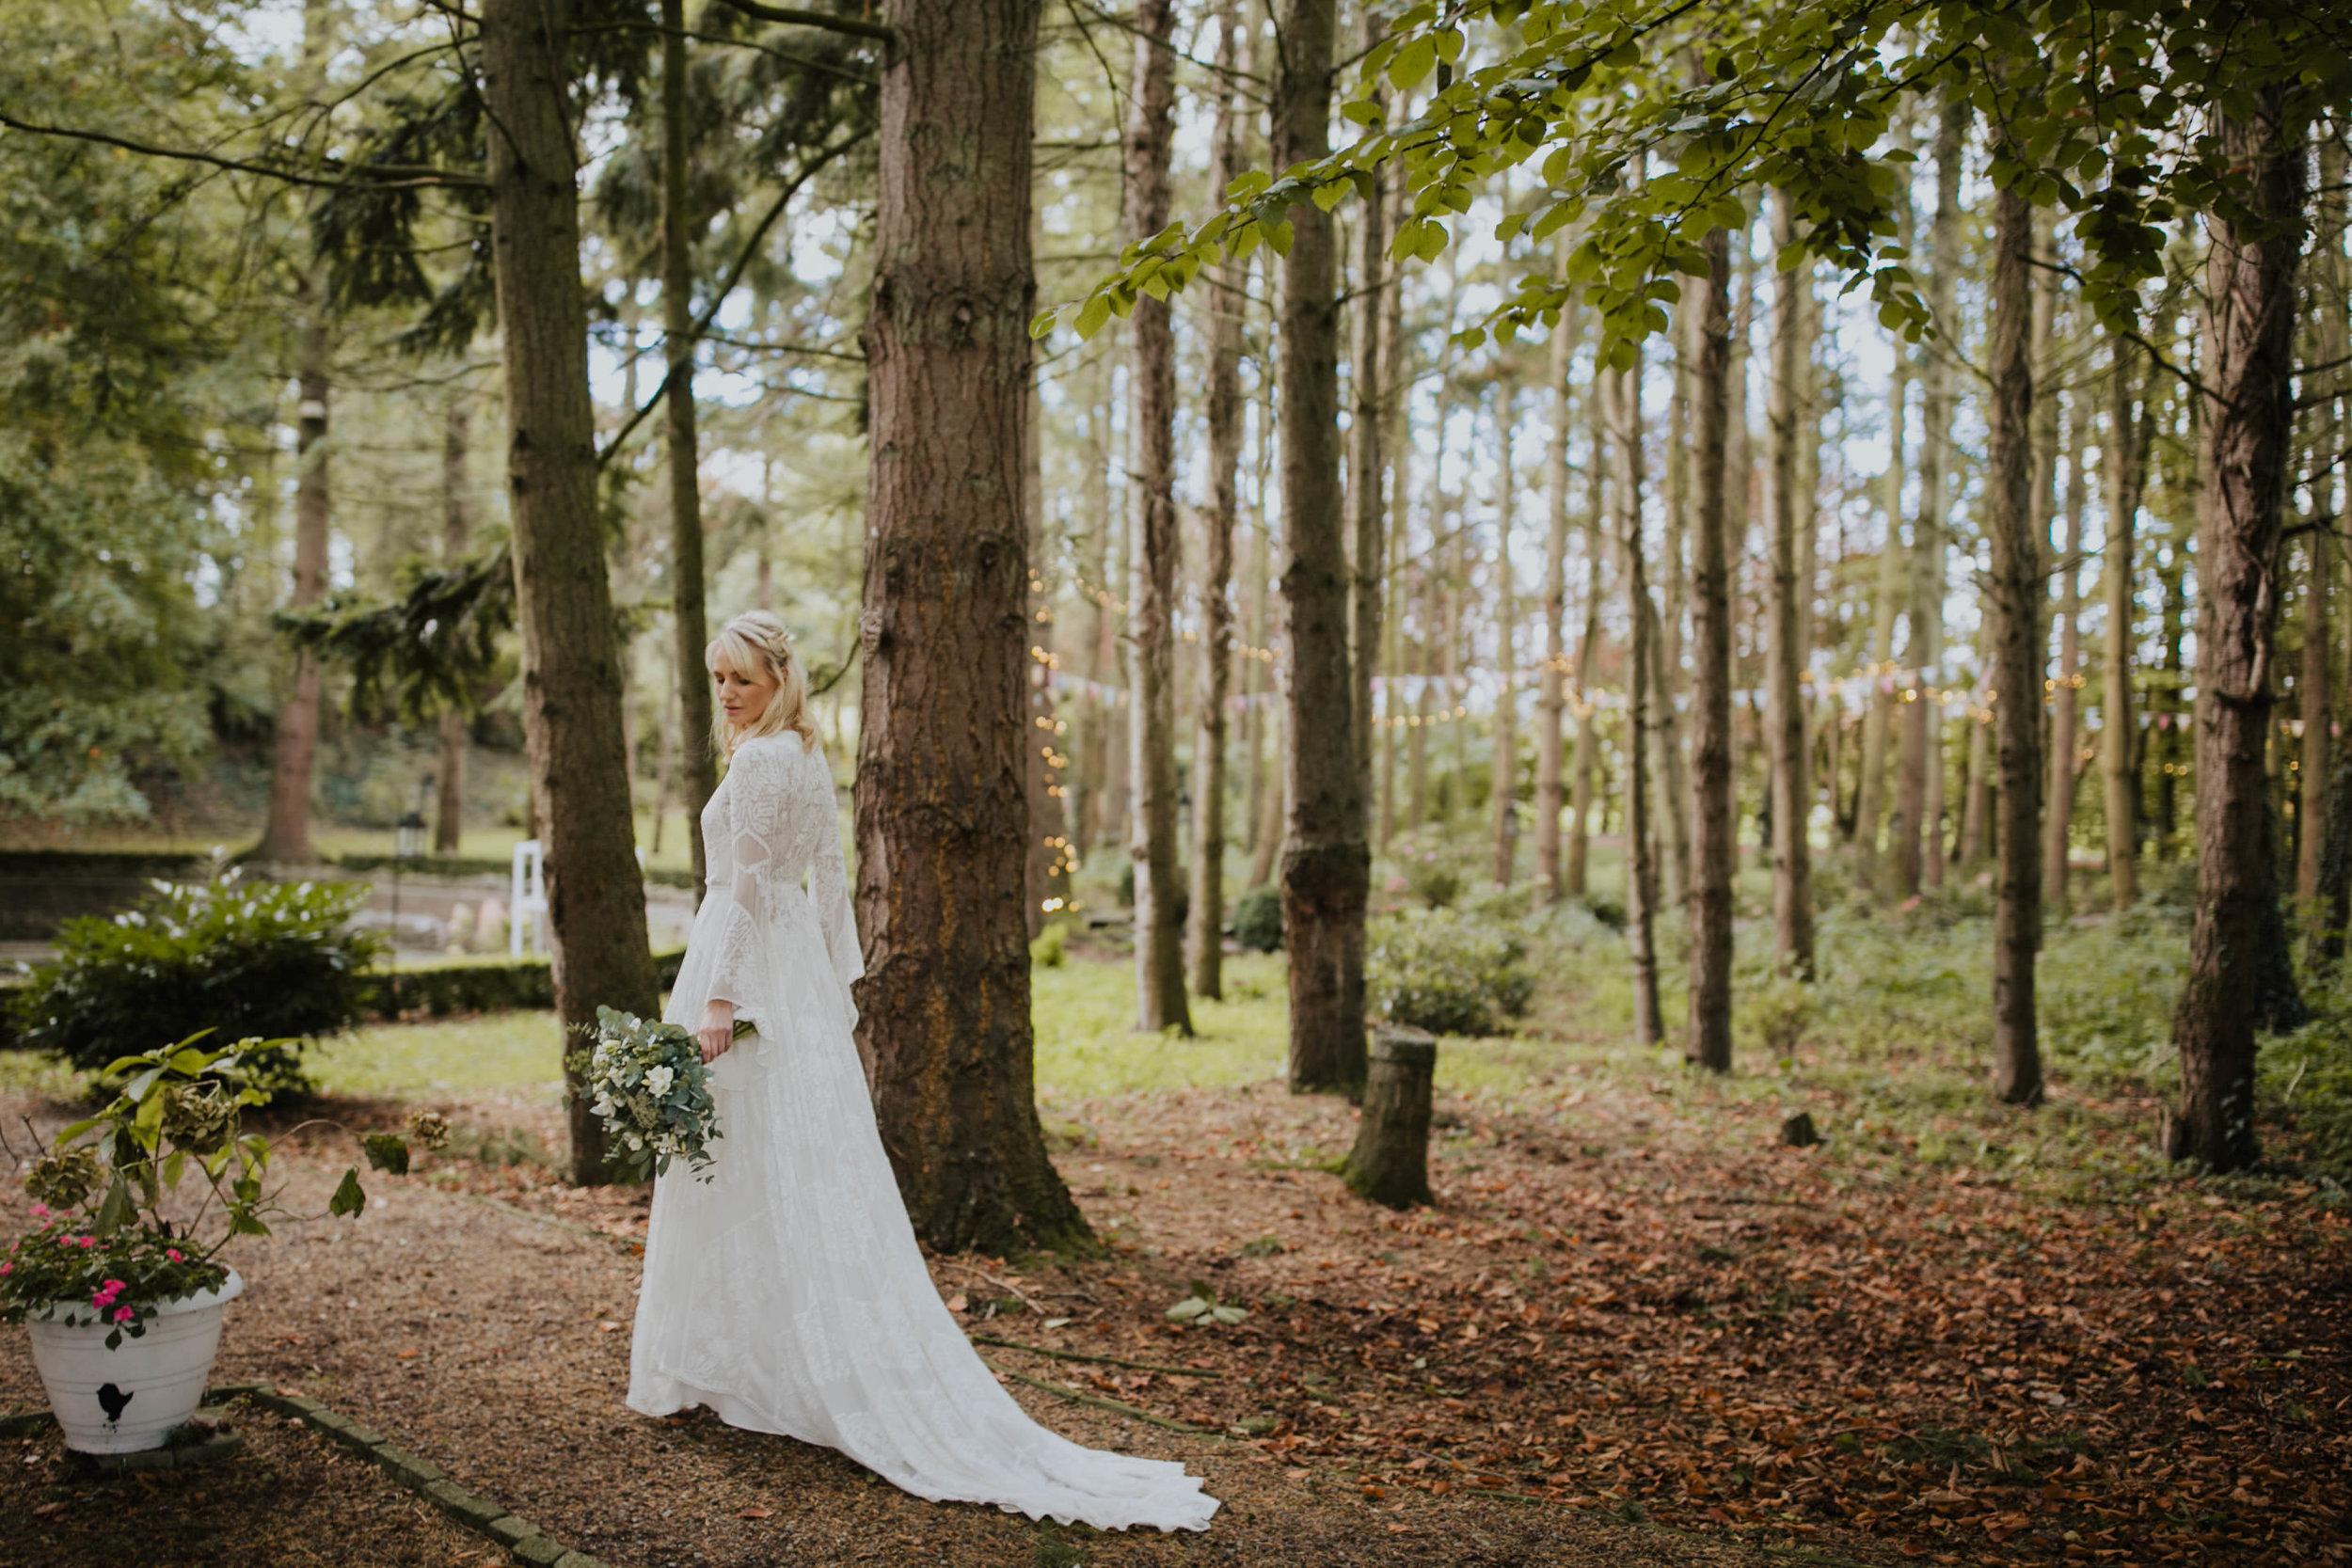 boho_wedding_alpaca_xpose_station_house_livia_figueiredo_photography_34.jpg